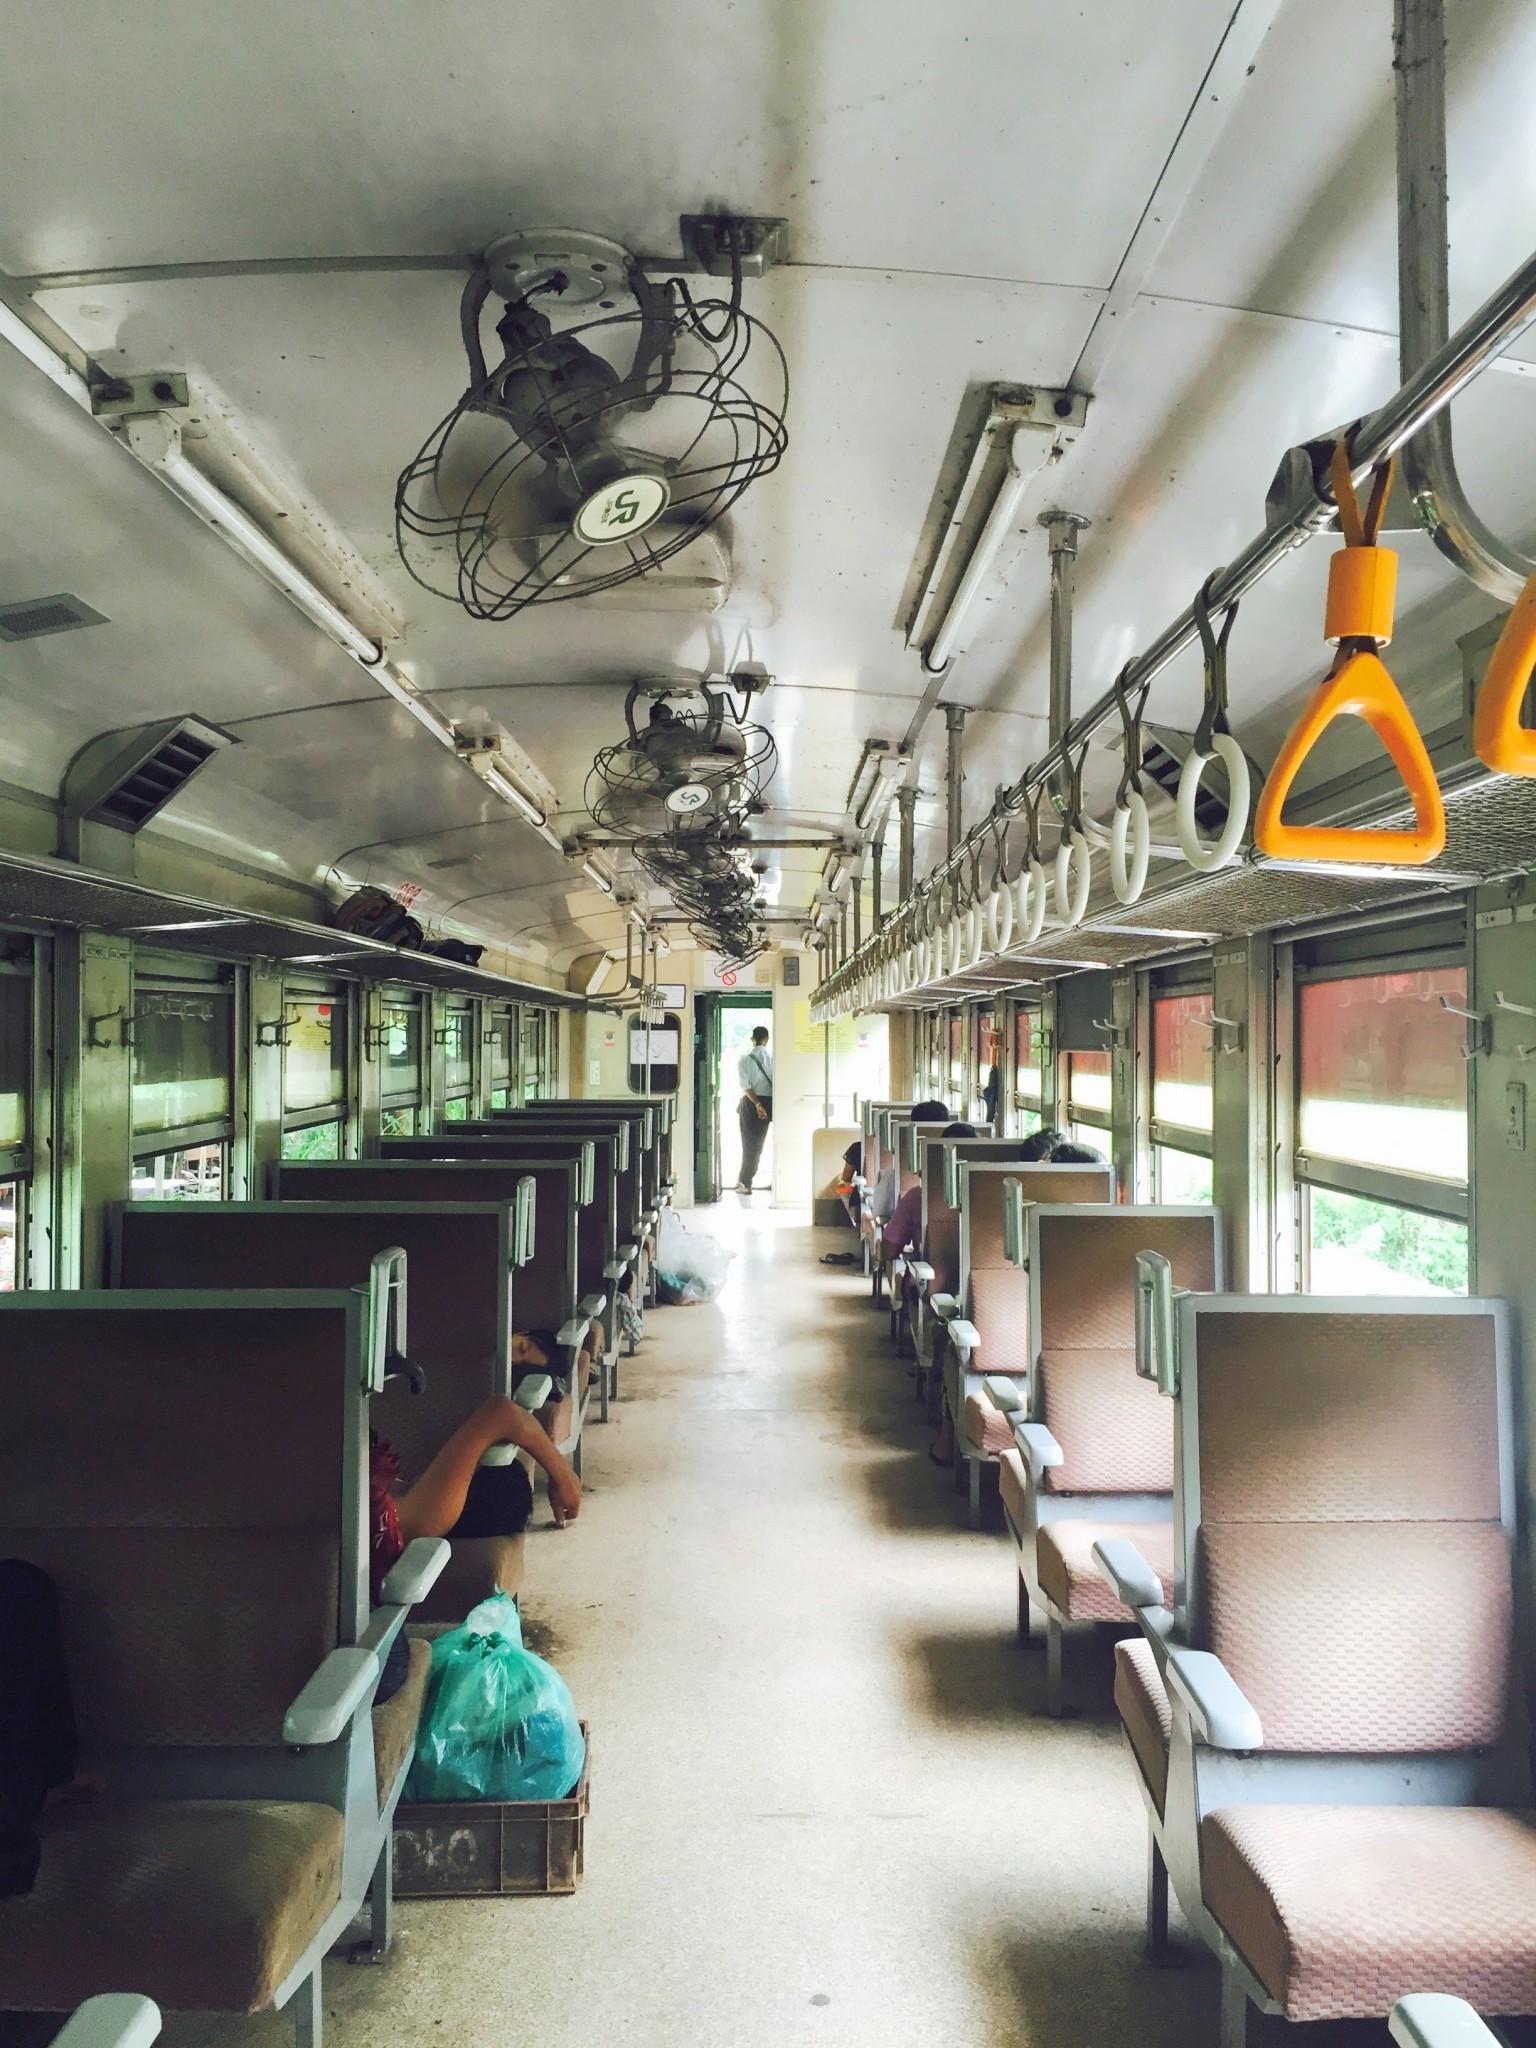 Inside the Circular Train